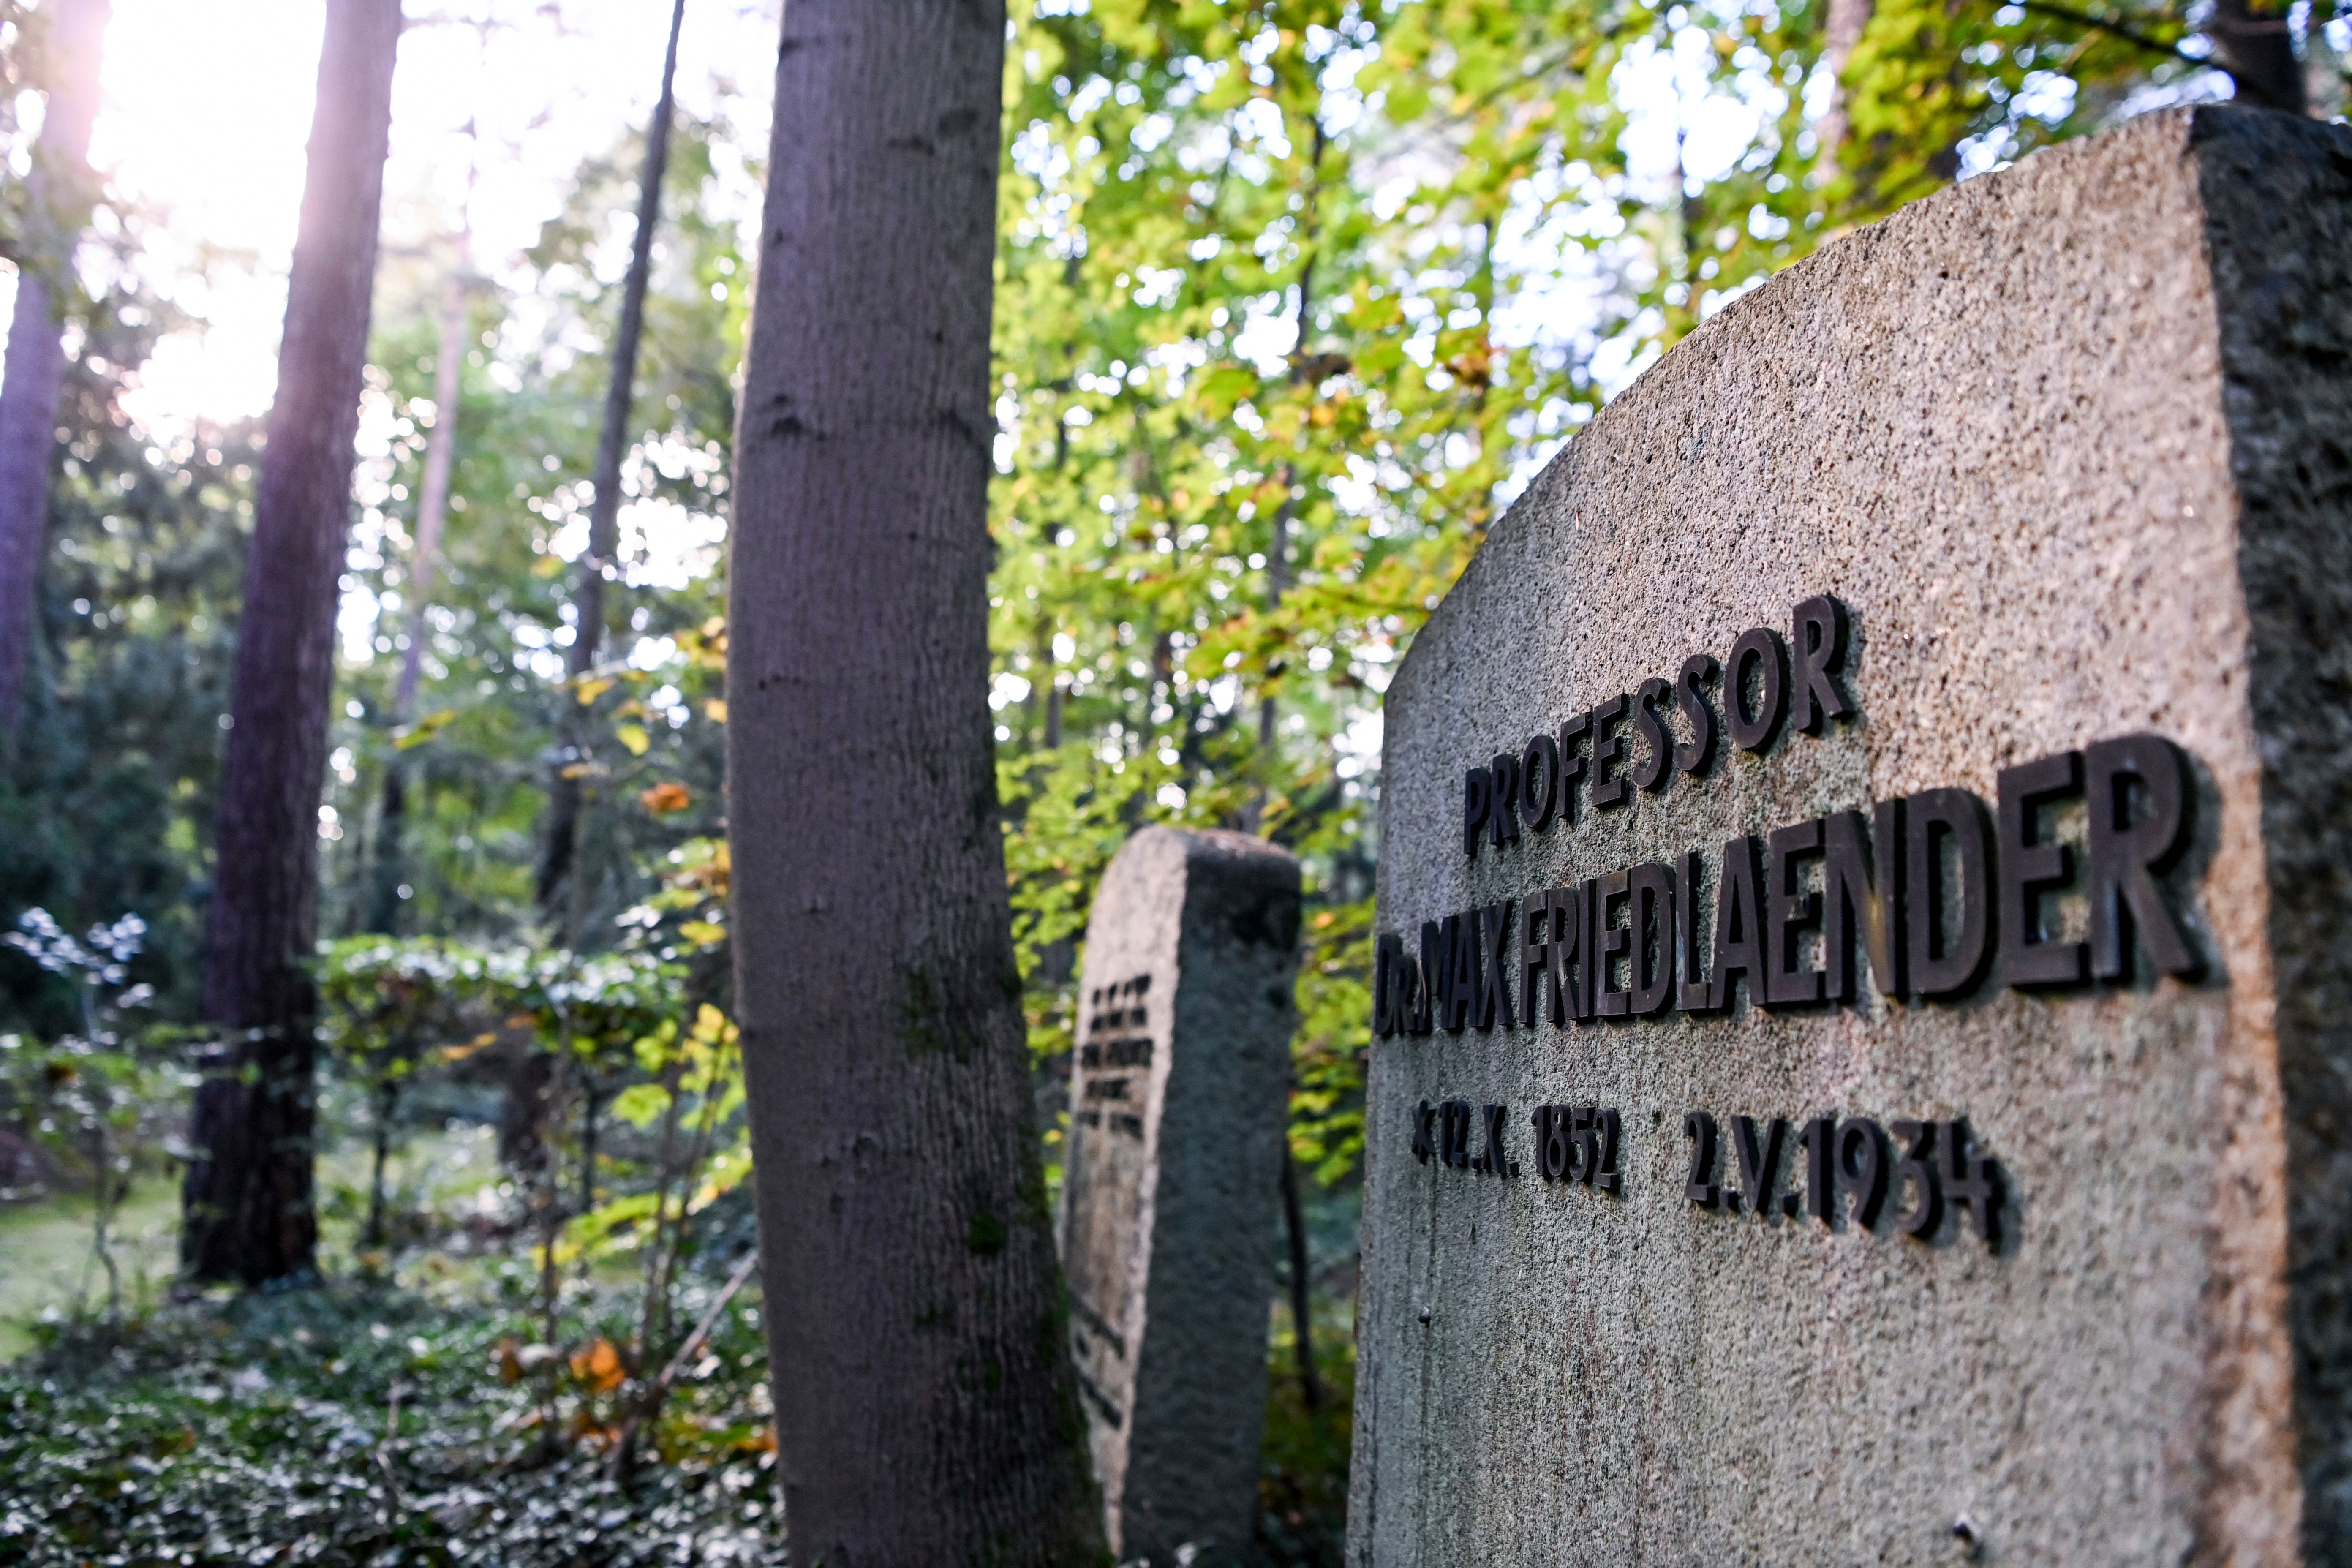 Neo-Nazi's burial in Jewish gravesite causes stir in Germany